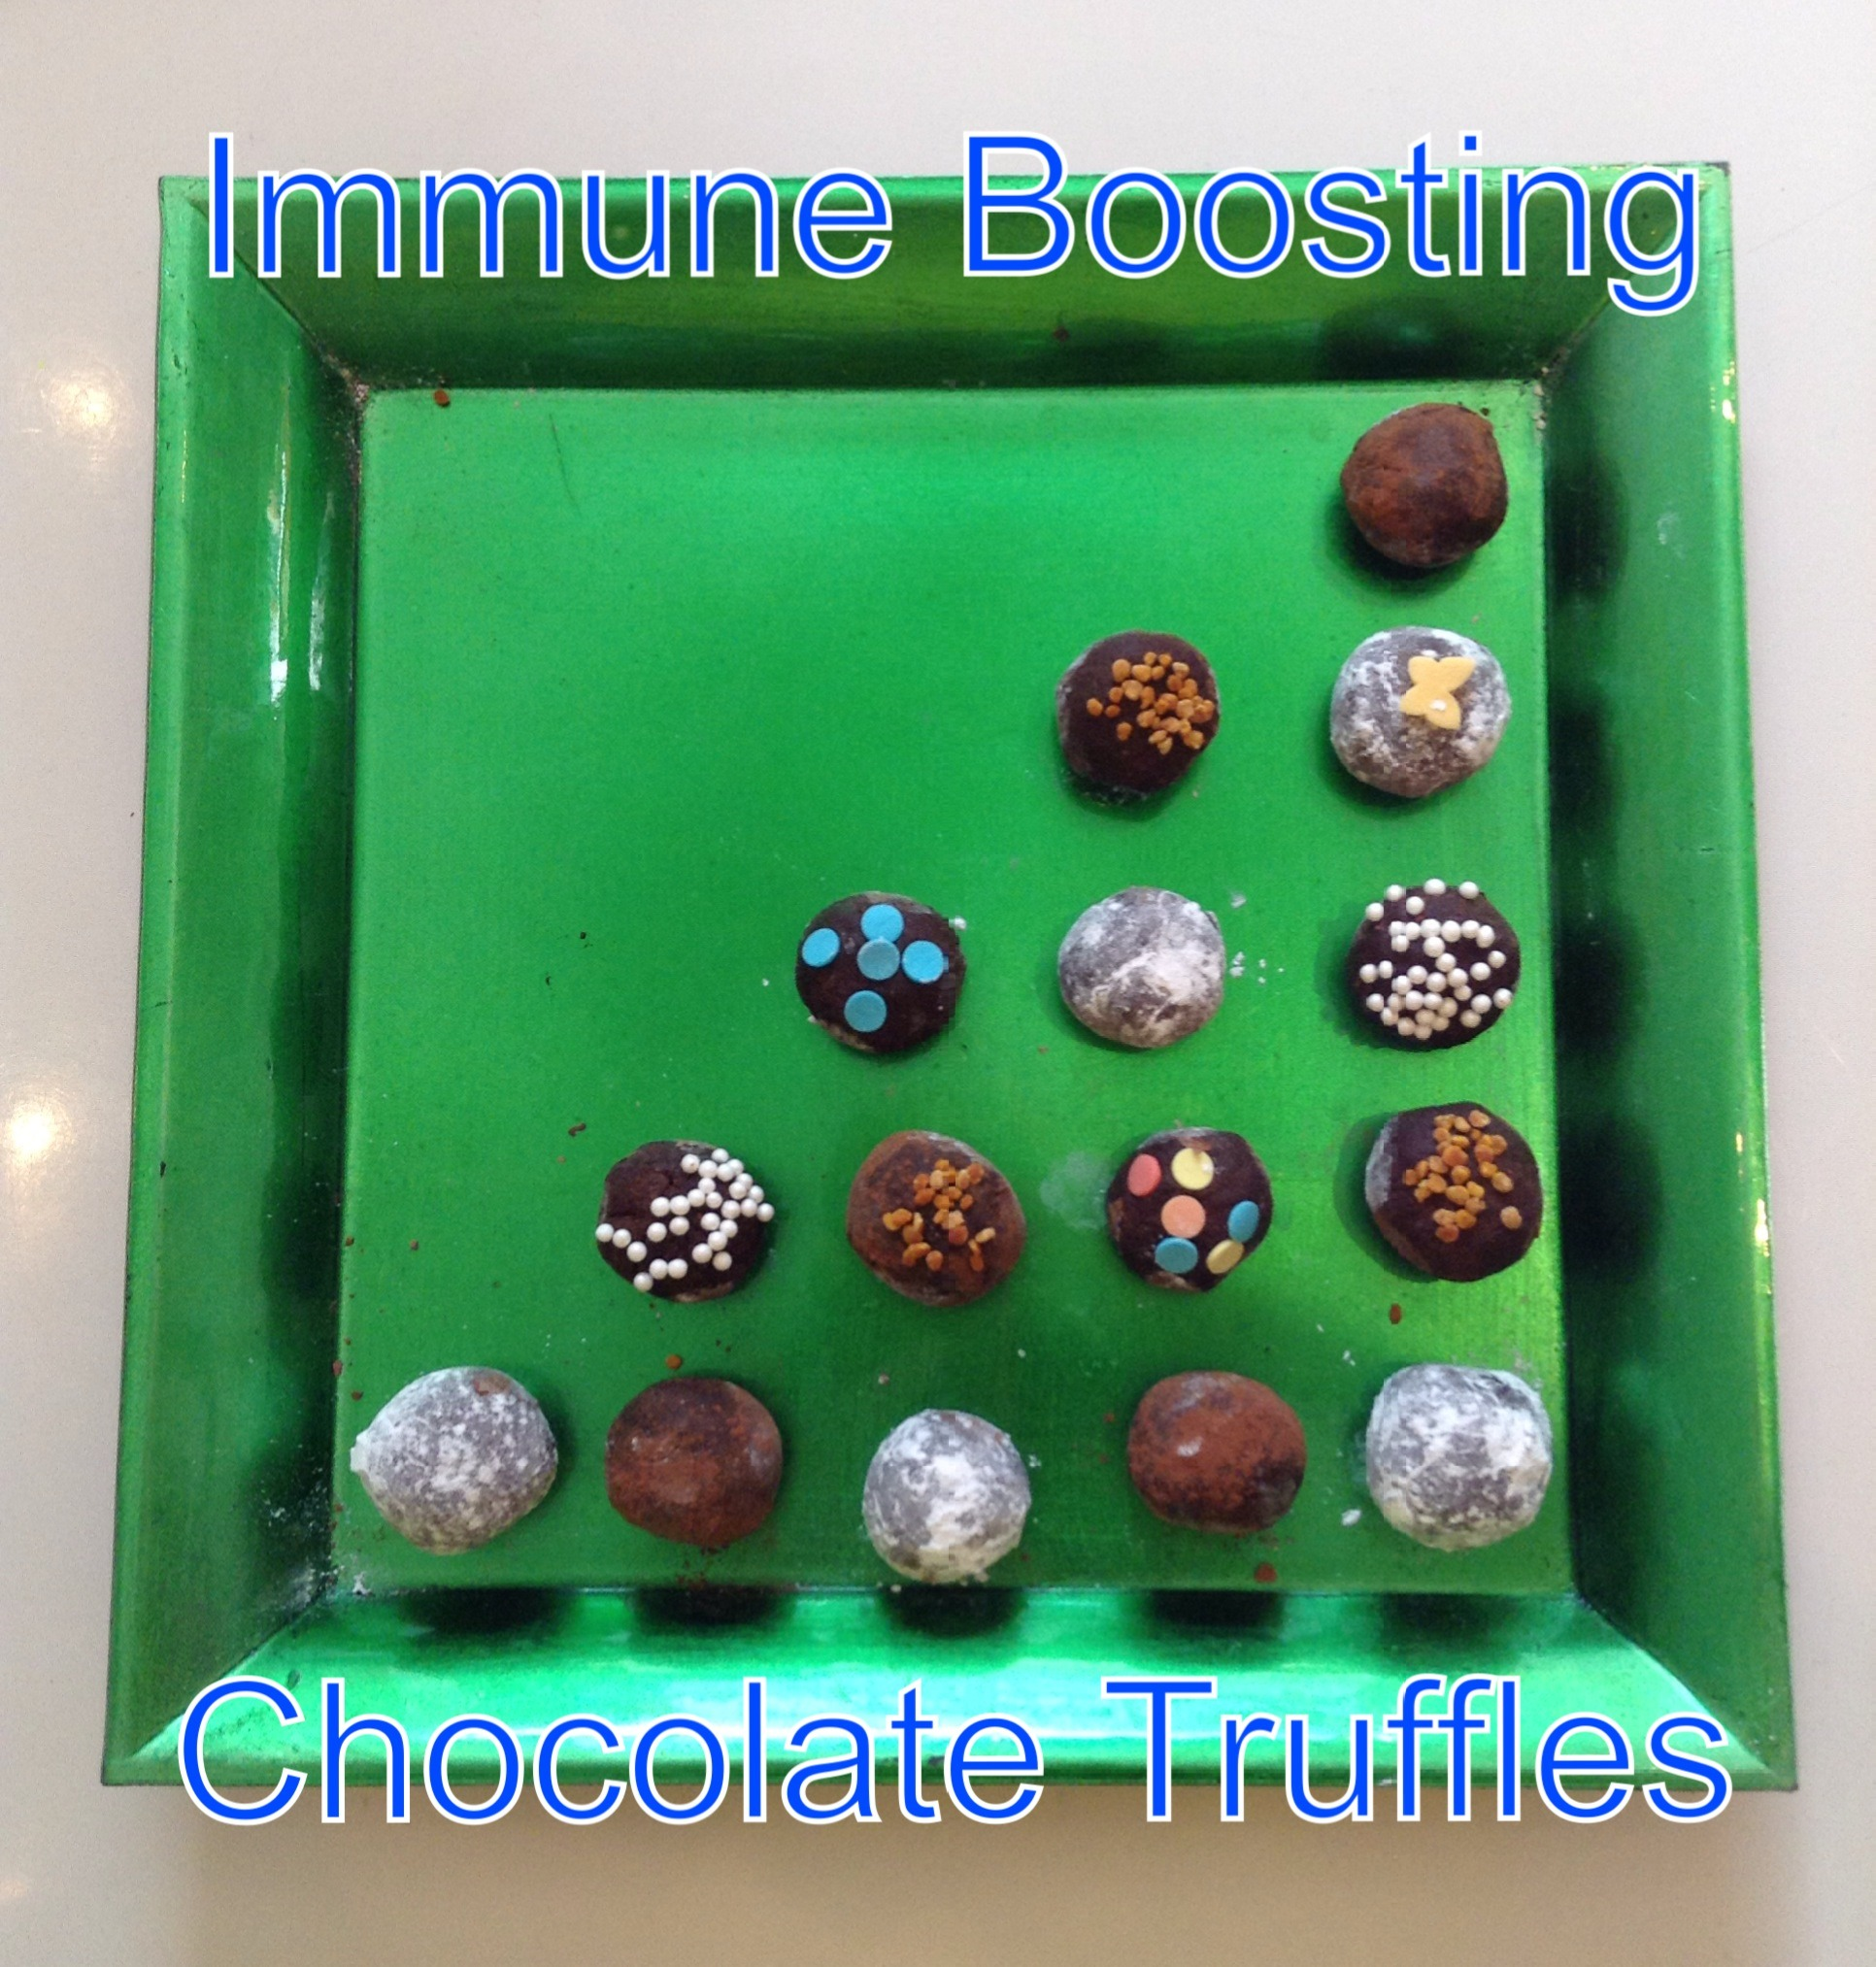 Picture of Immune-Boosting Chocolate Truffles